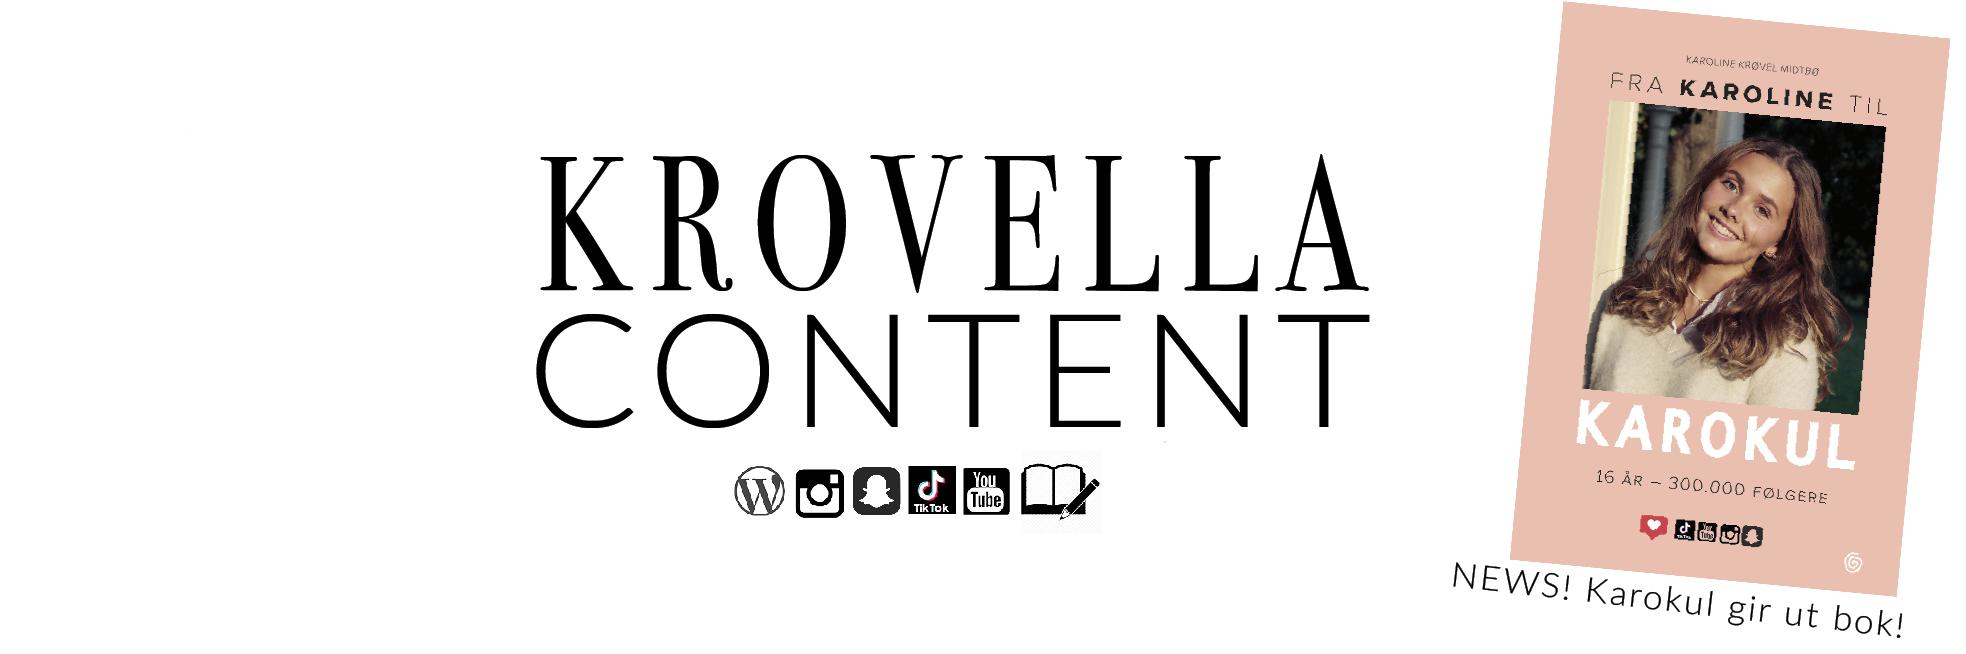 Krovella Content